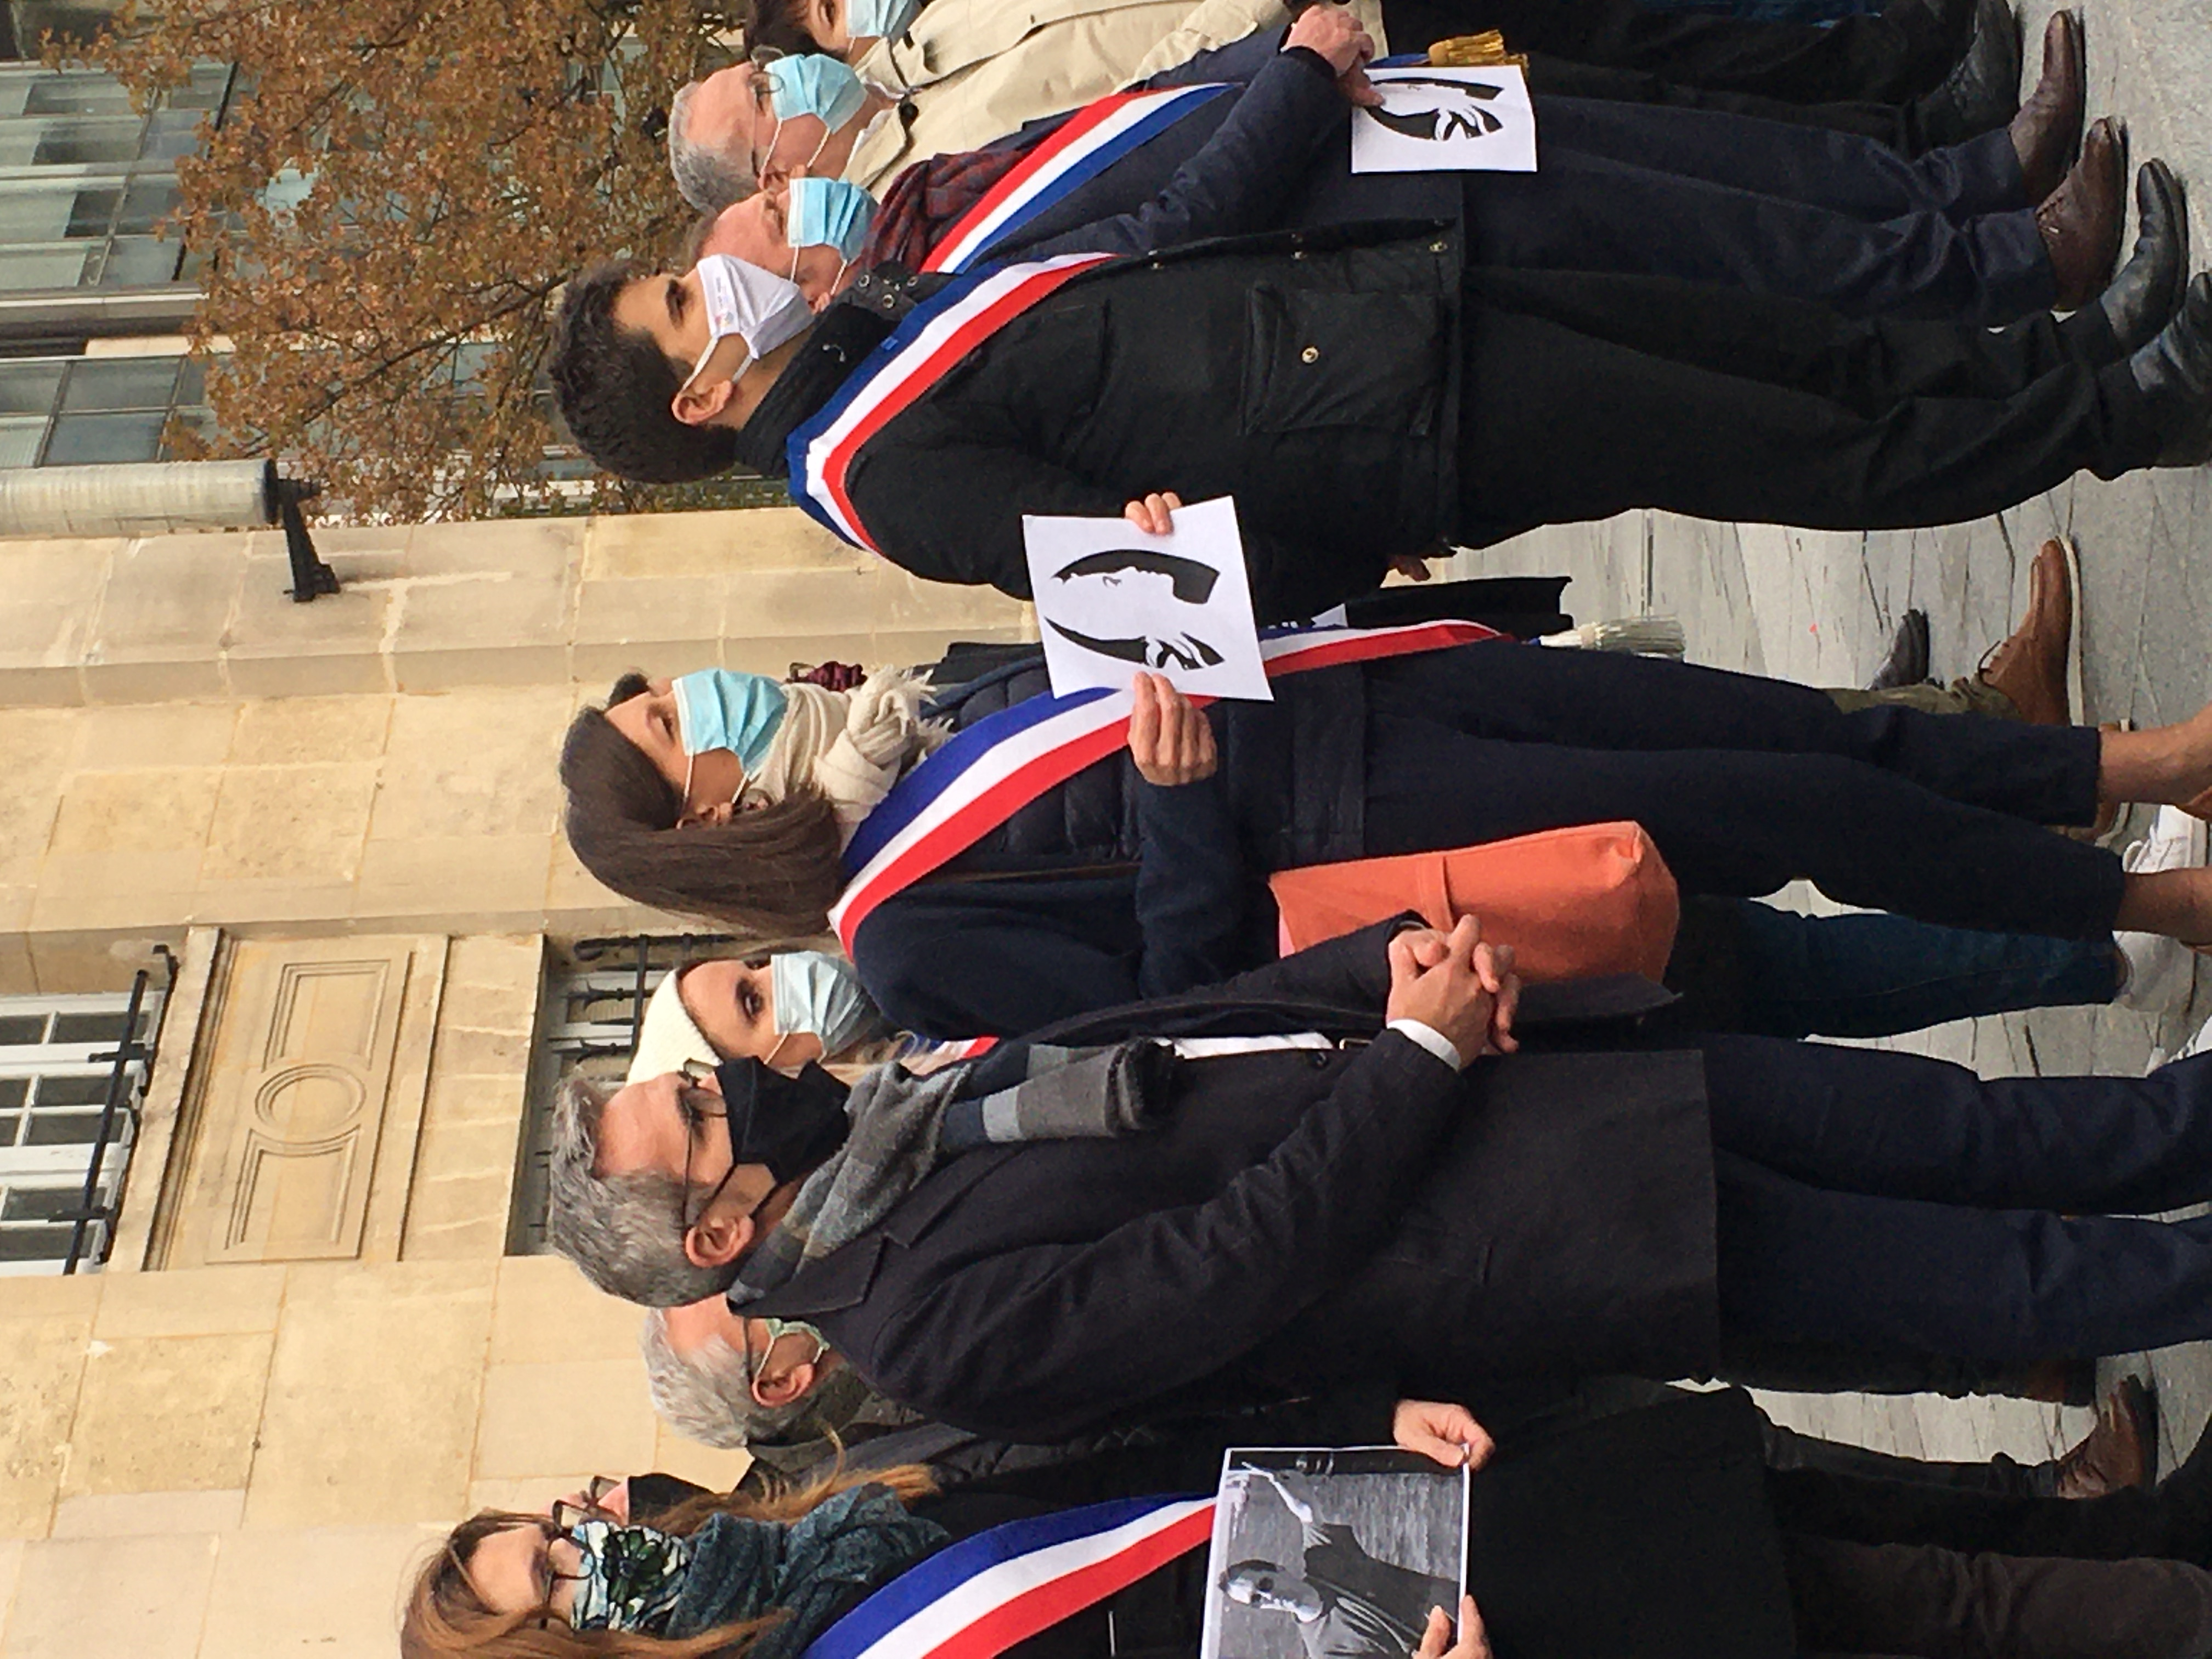 File:Hommage Samuel Paty Saint-Denis 17 octobre 2020.jpg - Wikimedia Commons